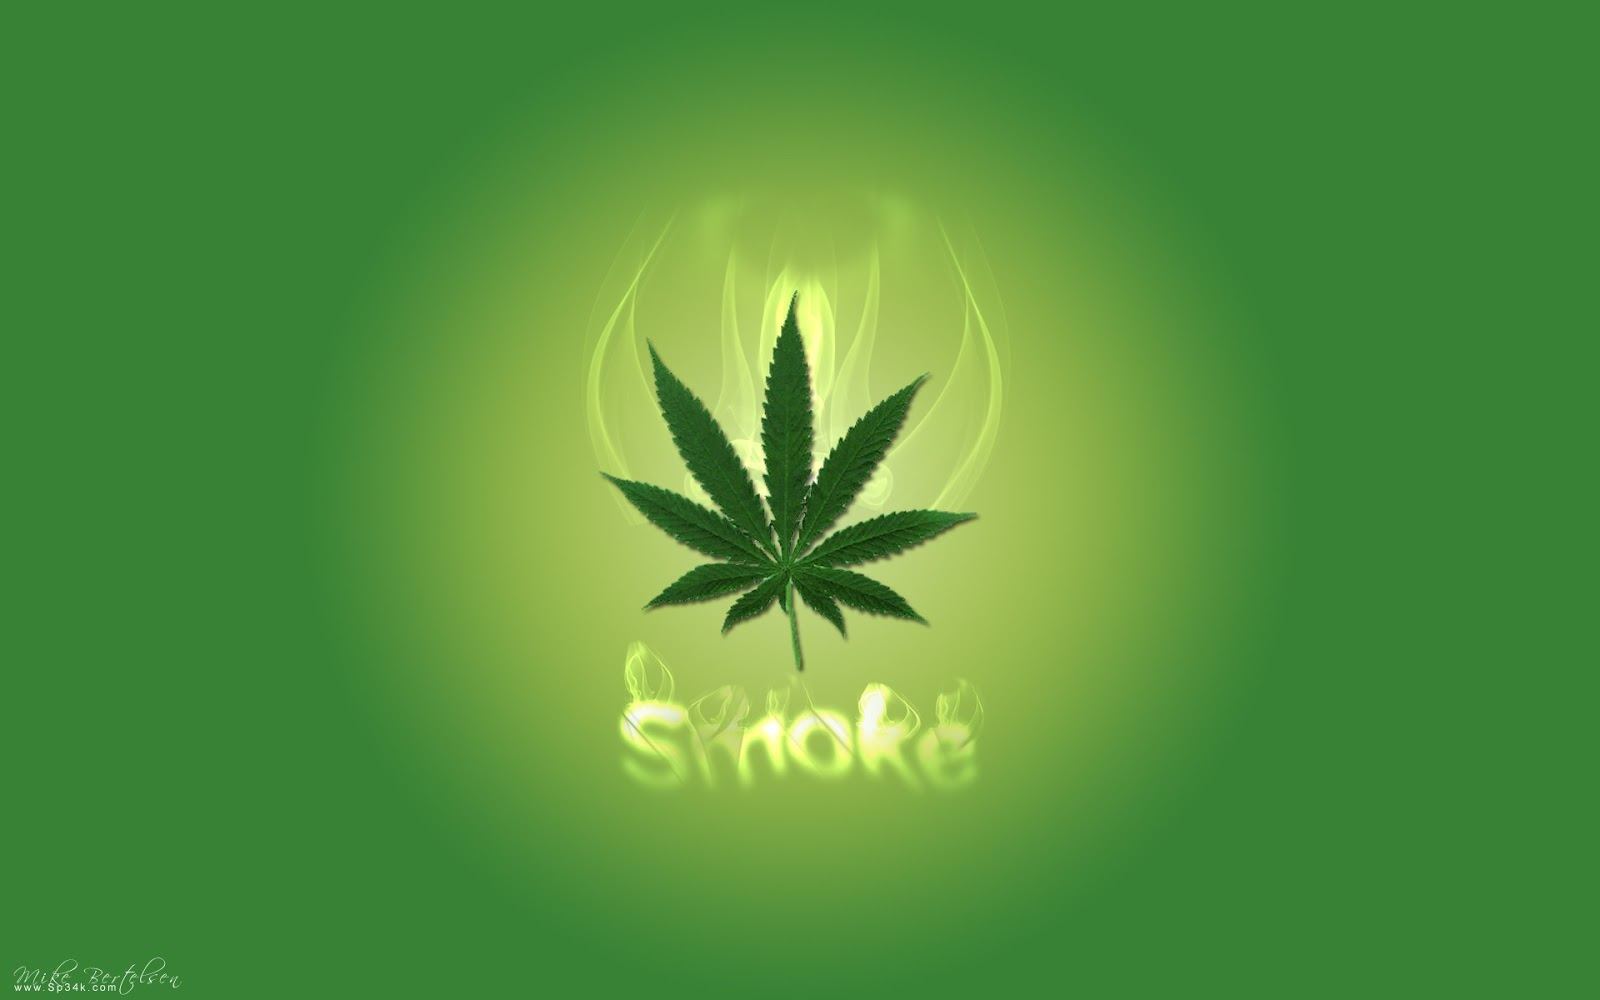 marijuana desktop background vladmodels alcohol wallpapers alcohol 1600x1000